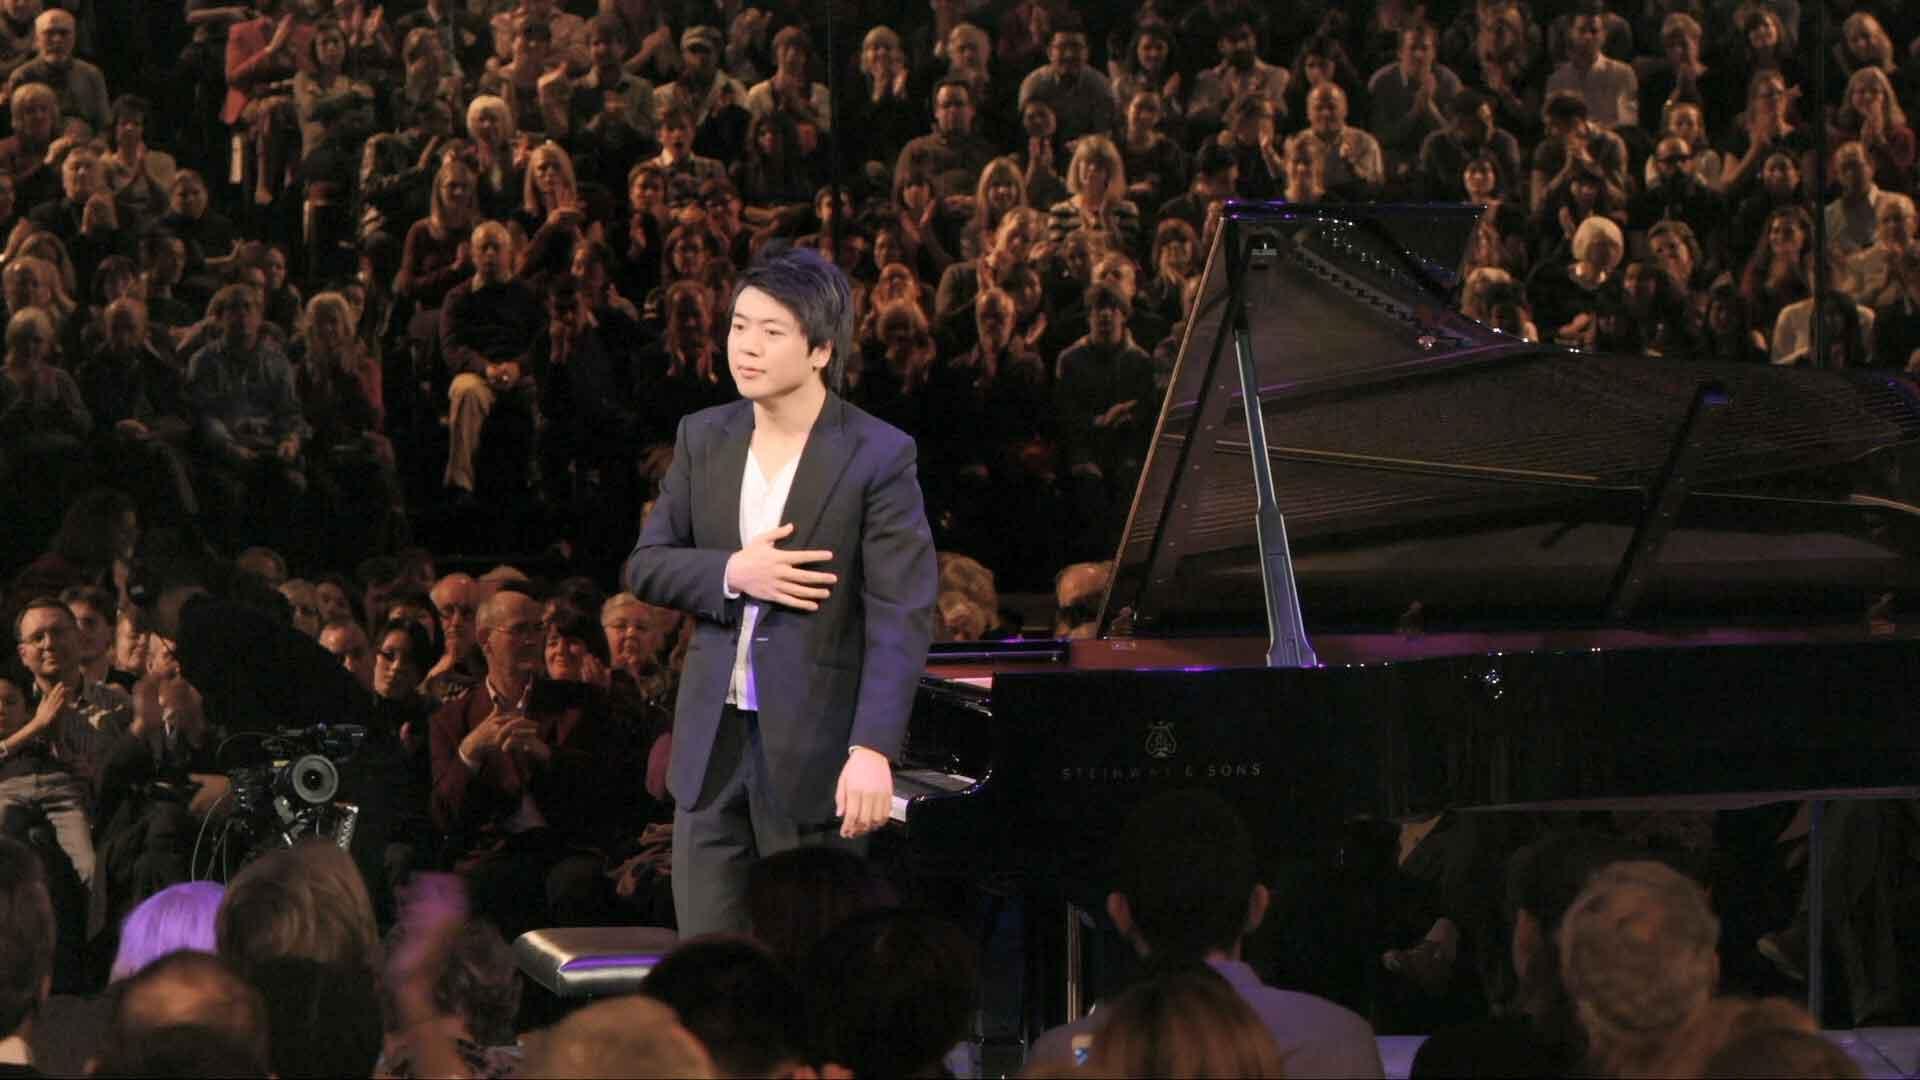 [蓝光原盘] 郎朗 2013皇家阿尔伯特音乐厅钢琴演奏会 Lang Lang at the Royal Albert Hall 2013《ISO 40.1G》